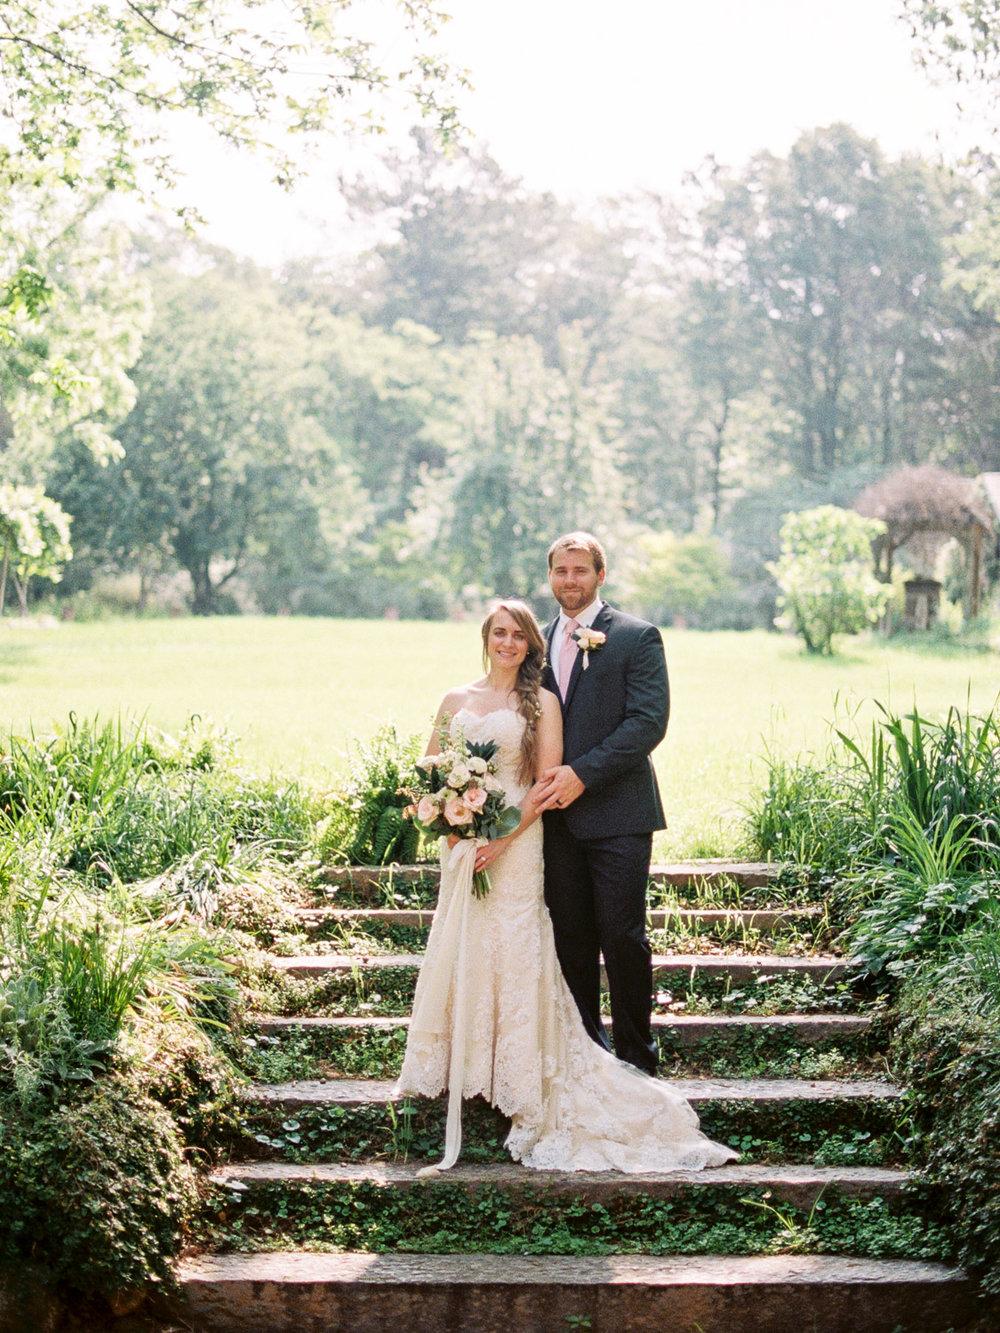 christinadavisphotography-romanticwedding-gardenweddinginspiration23.jpg